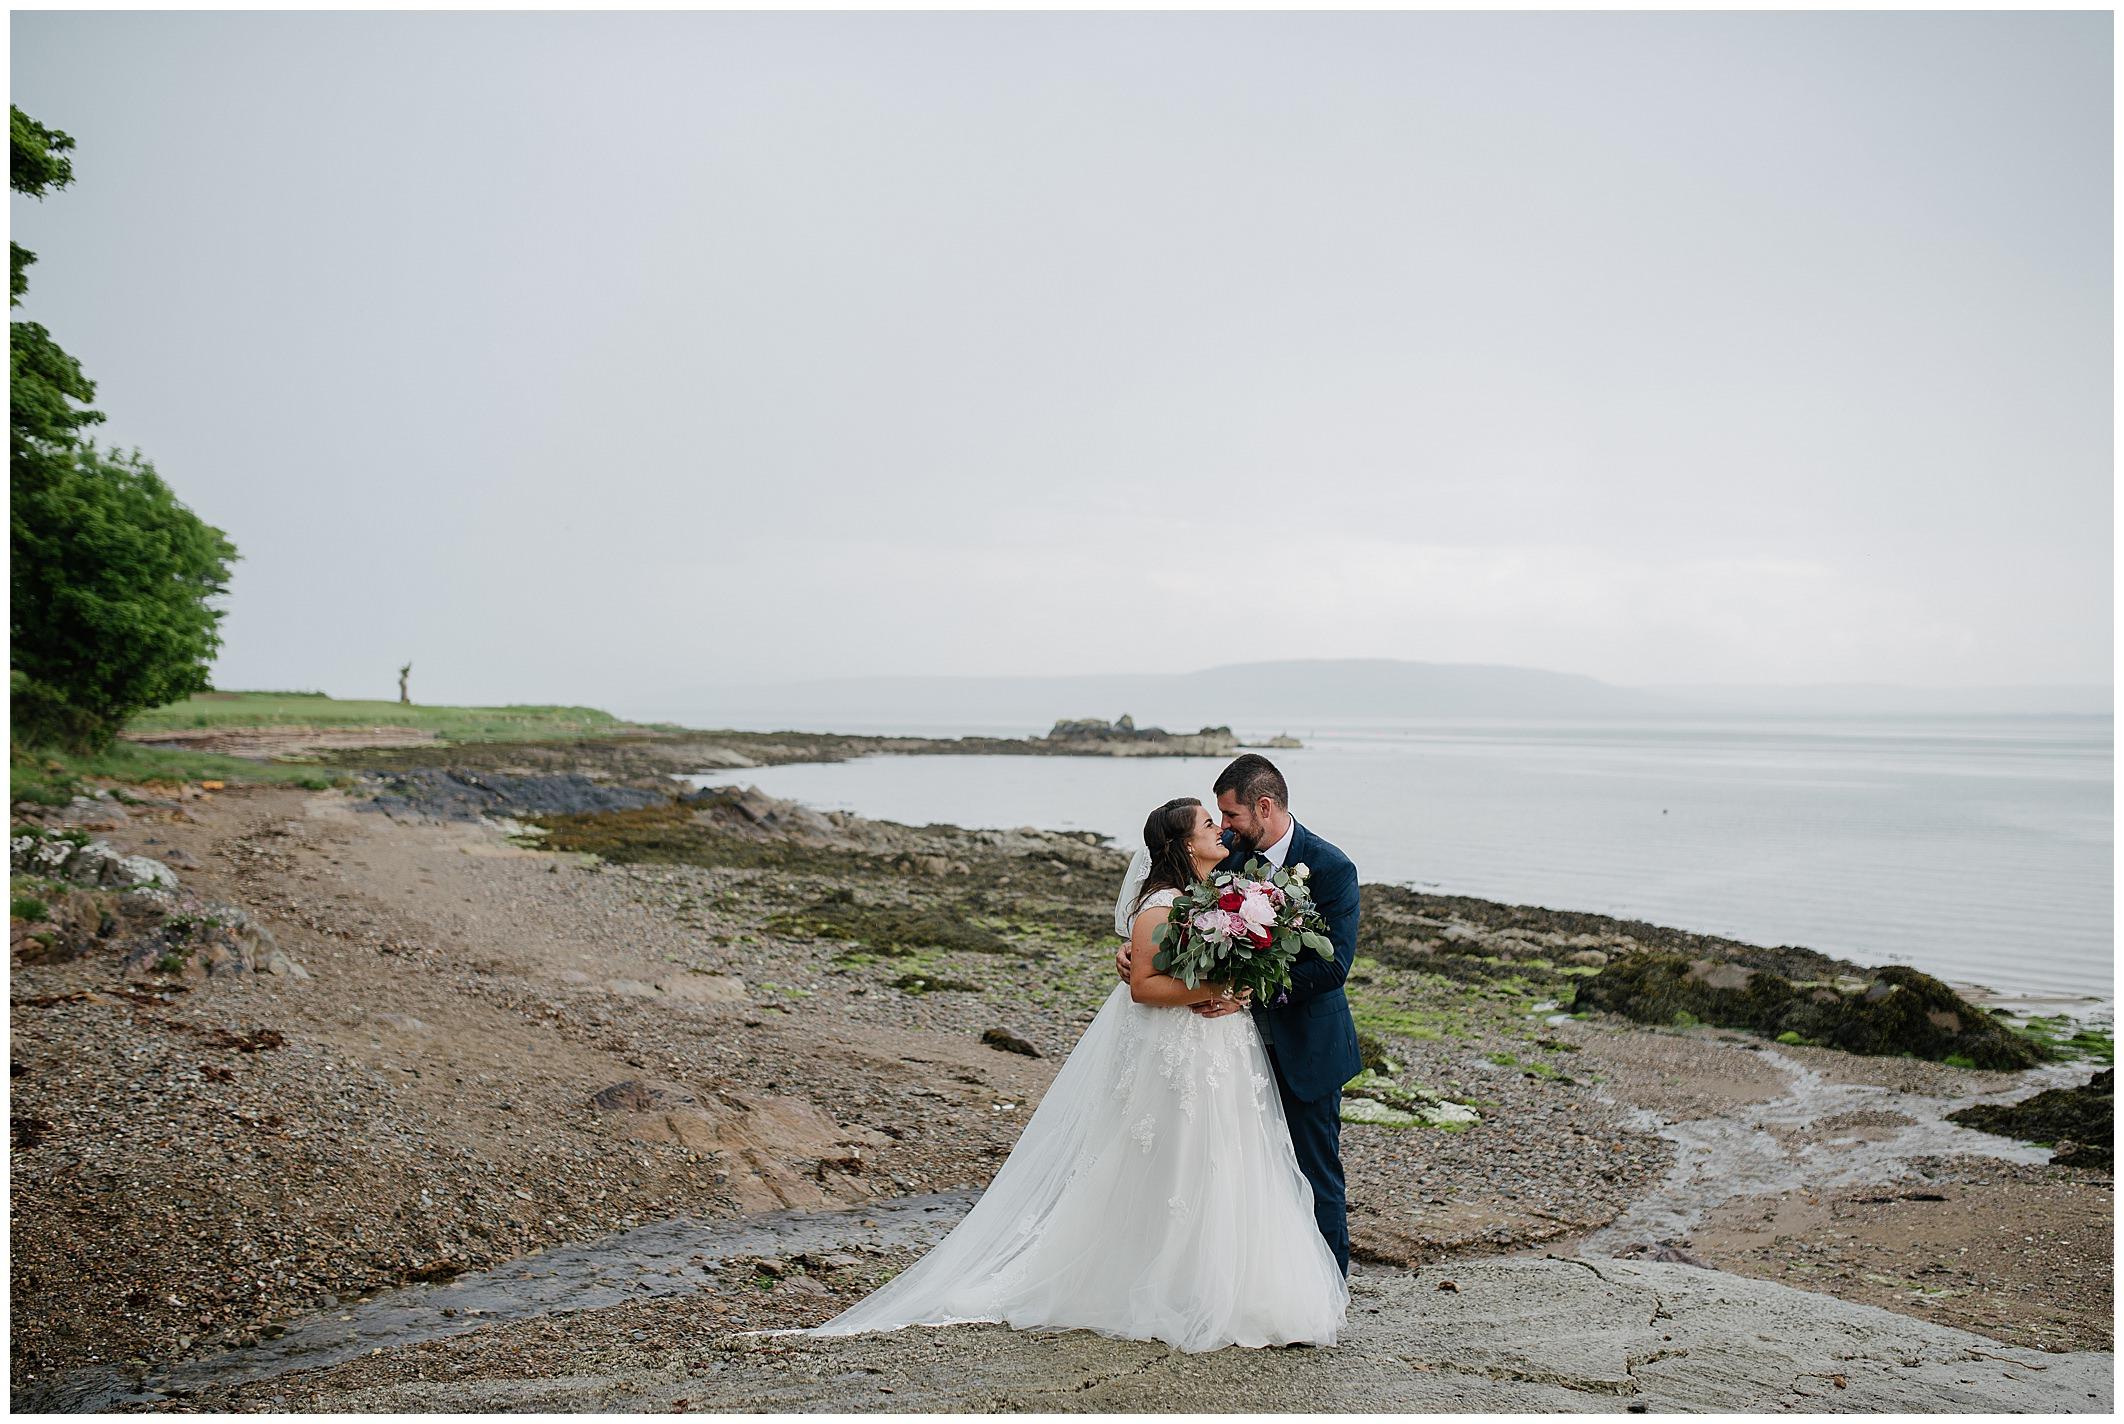 redcastle-hotel-wedding-karen-brian-jude-browne-photography-097.jpg